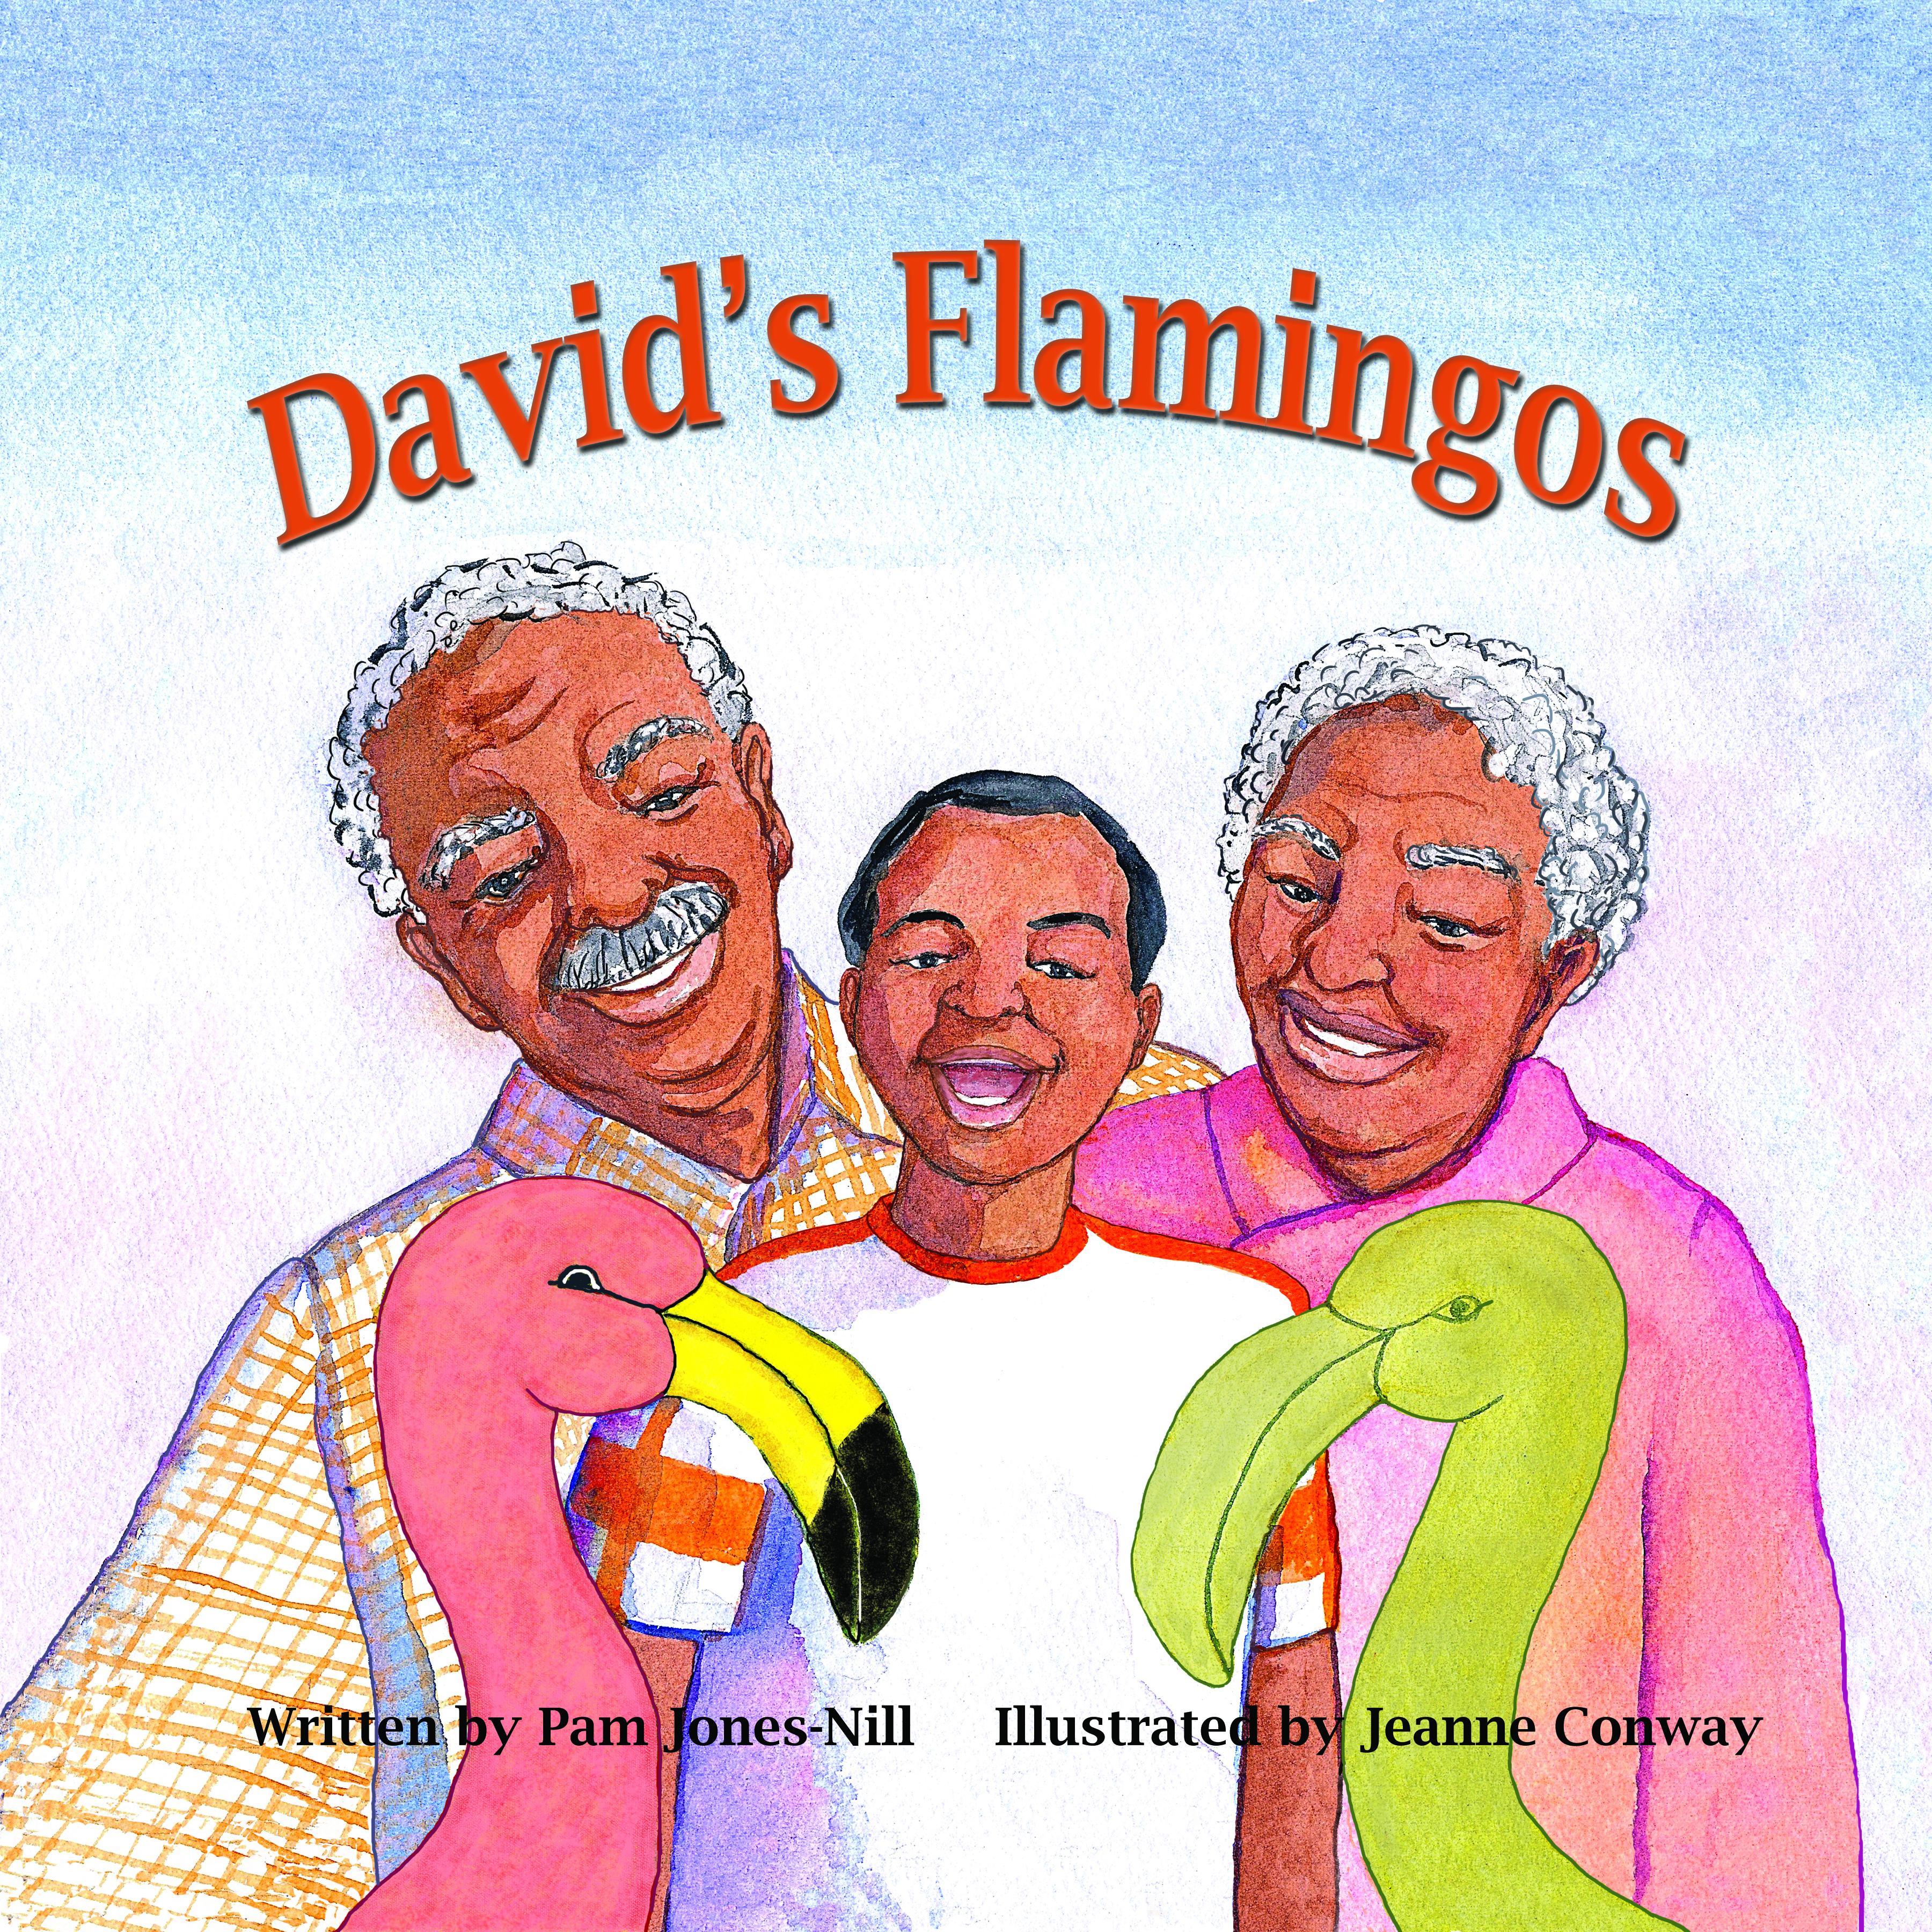 David's Flamingos By Pam Jones-Nill